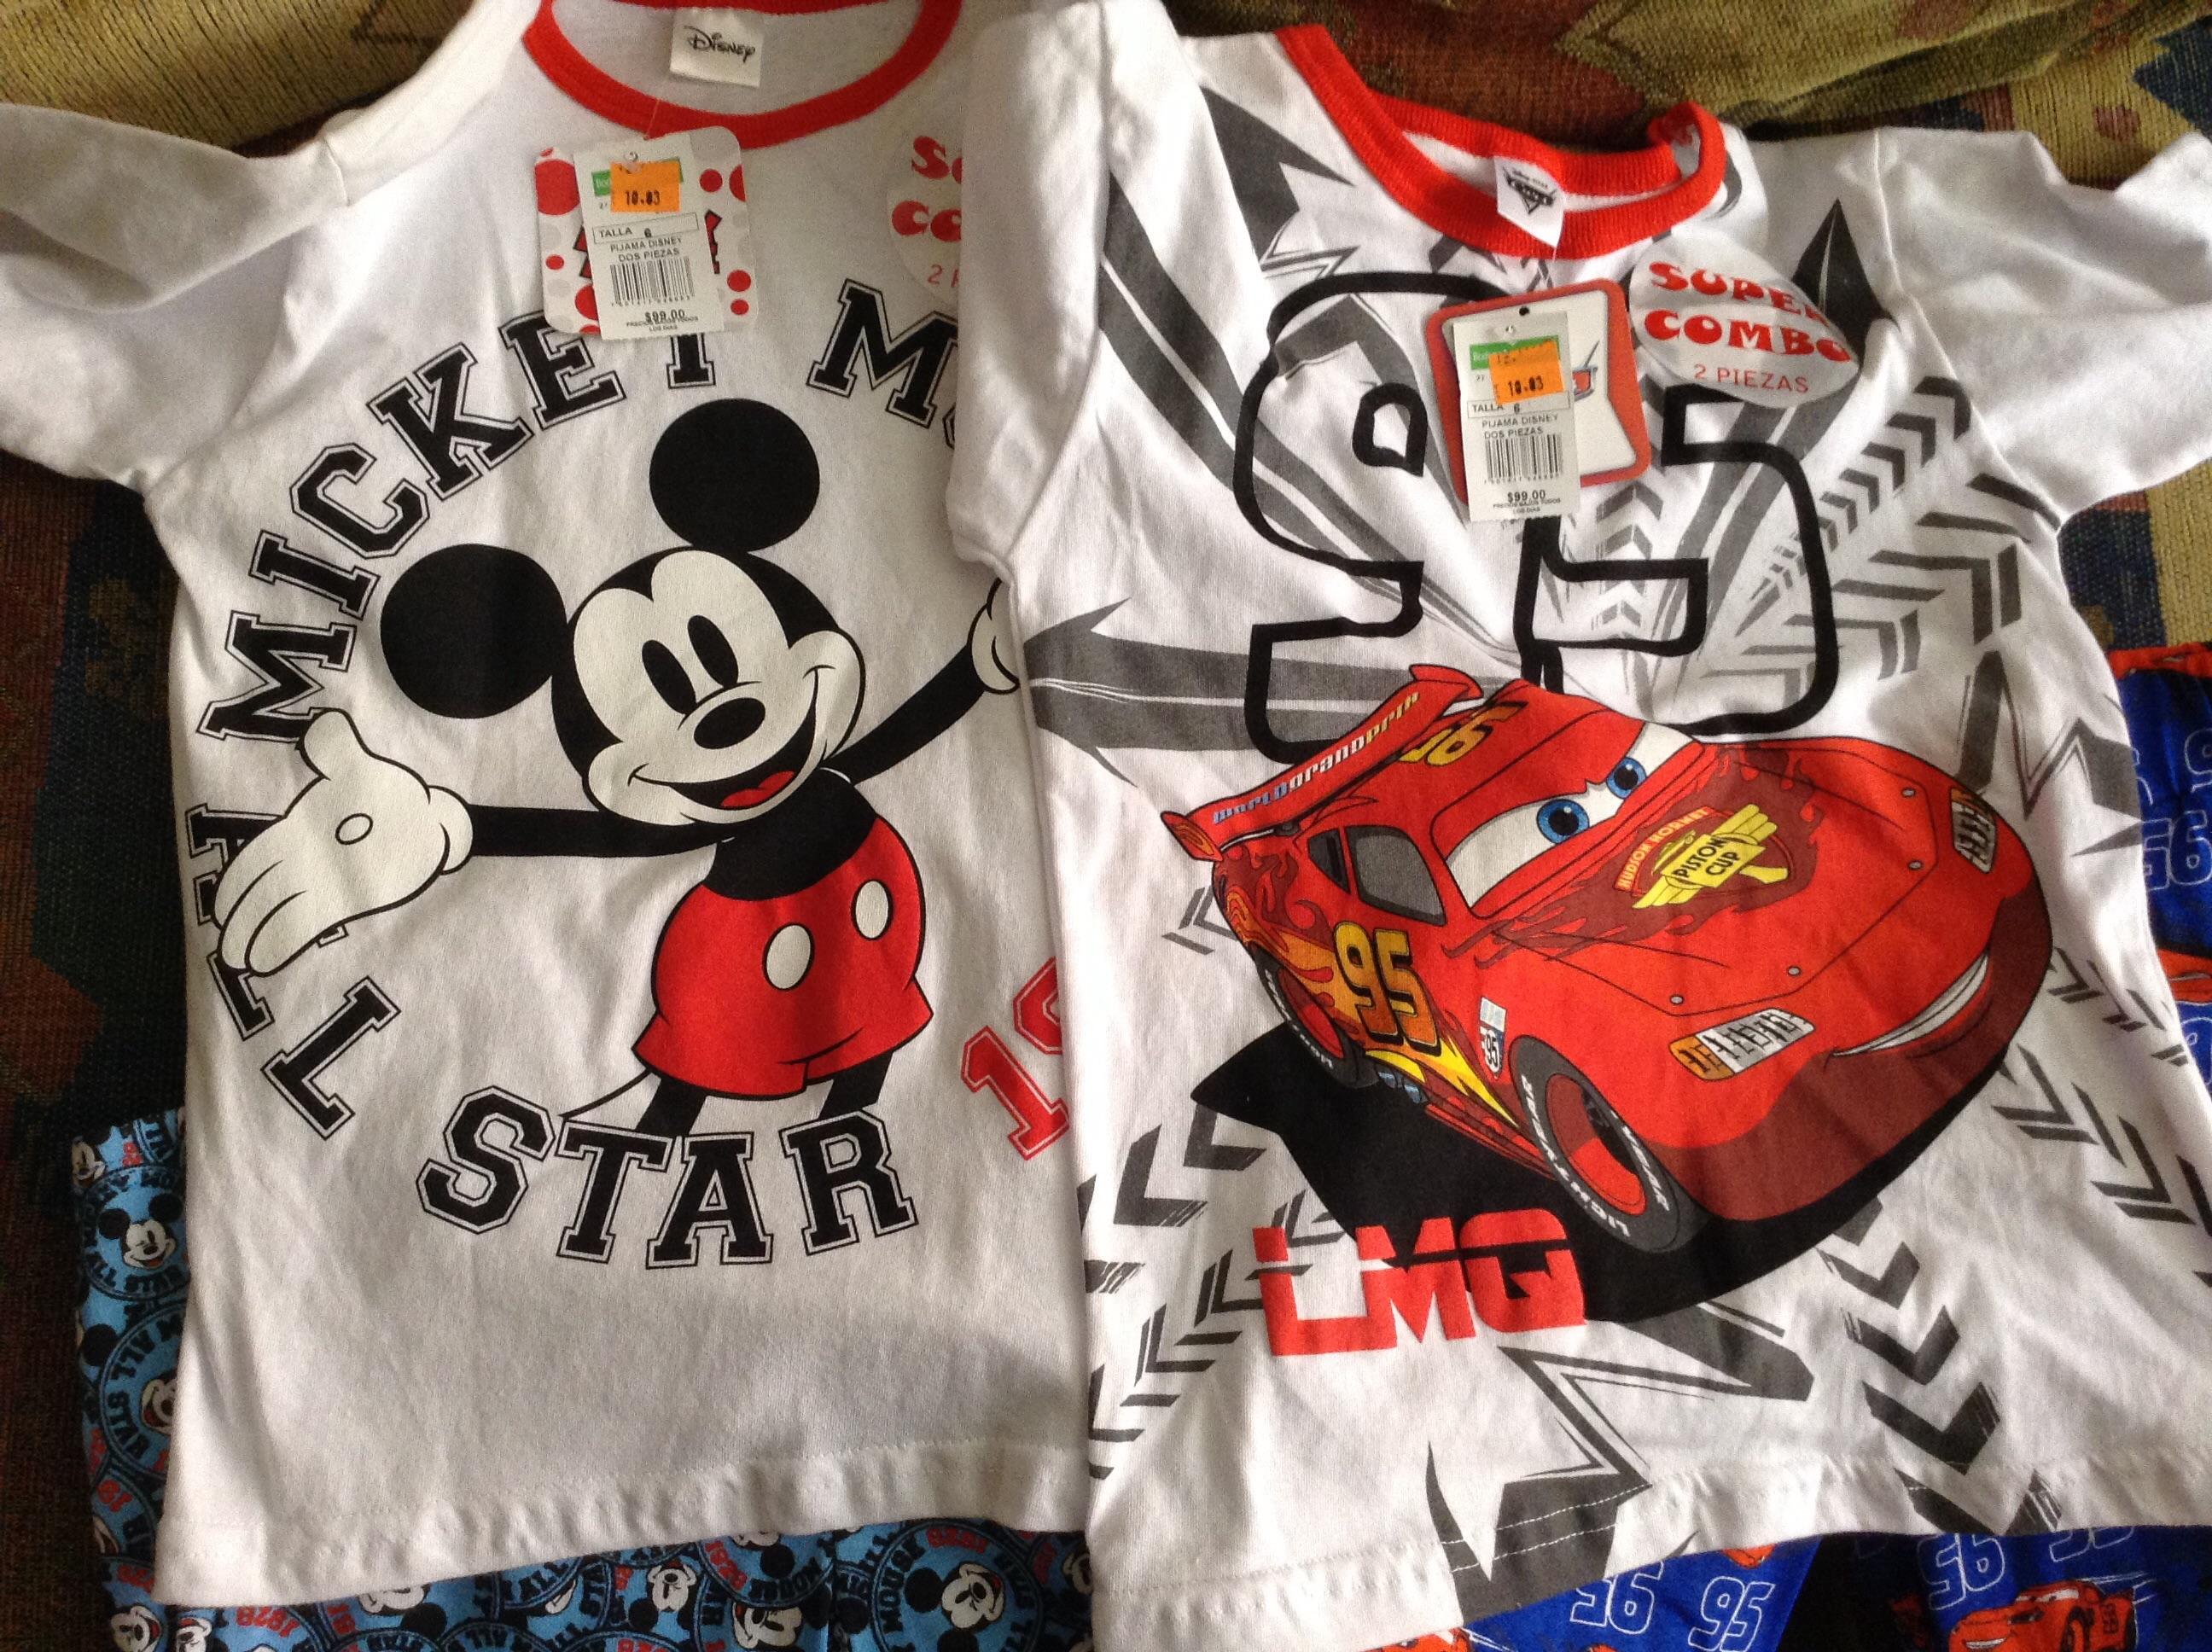 Bodega Aurrerá: Pijamas Disney y Cars en $10.03